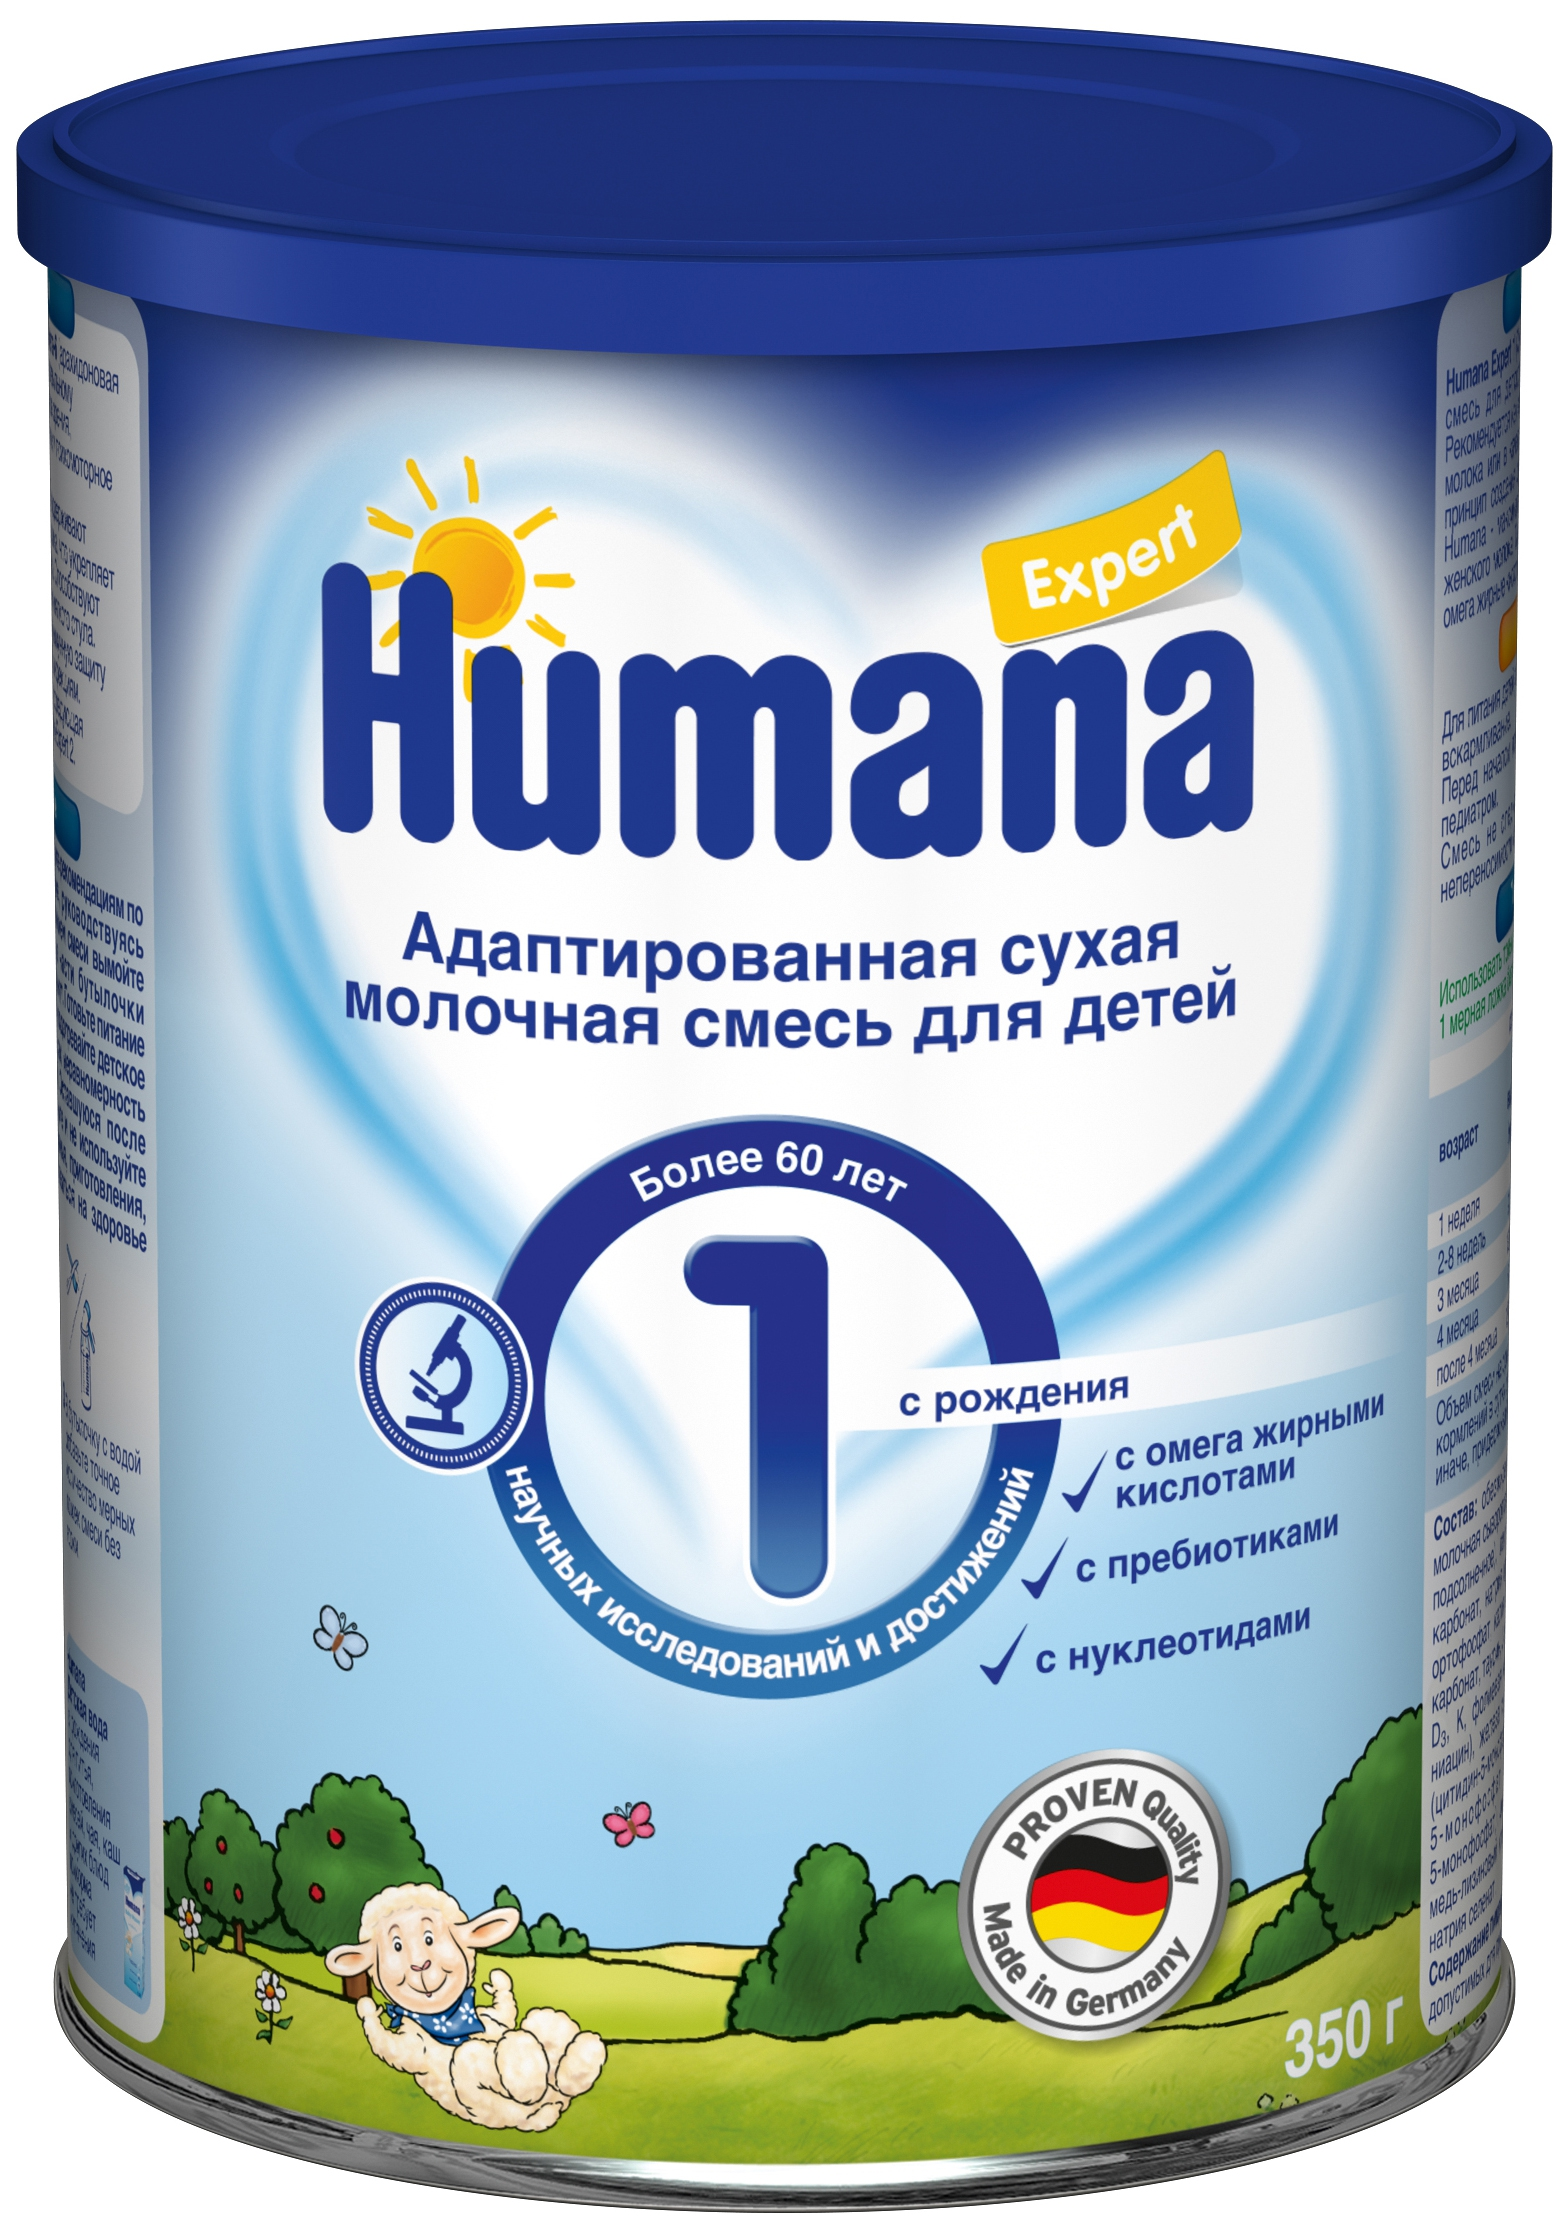 Сухие Хумана Humana Expert 1 (с рождения) 350 г